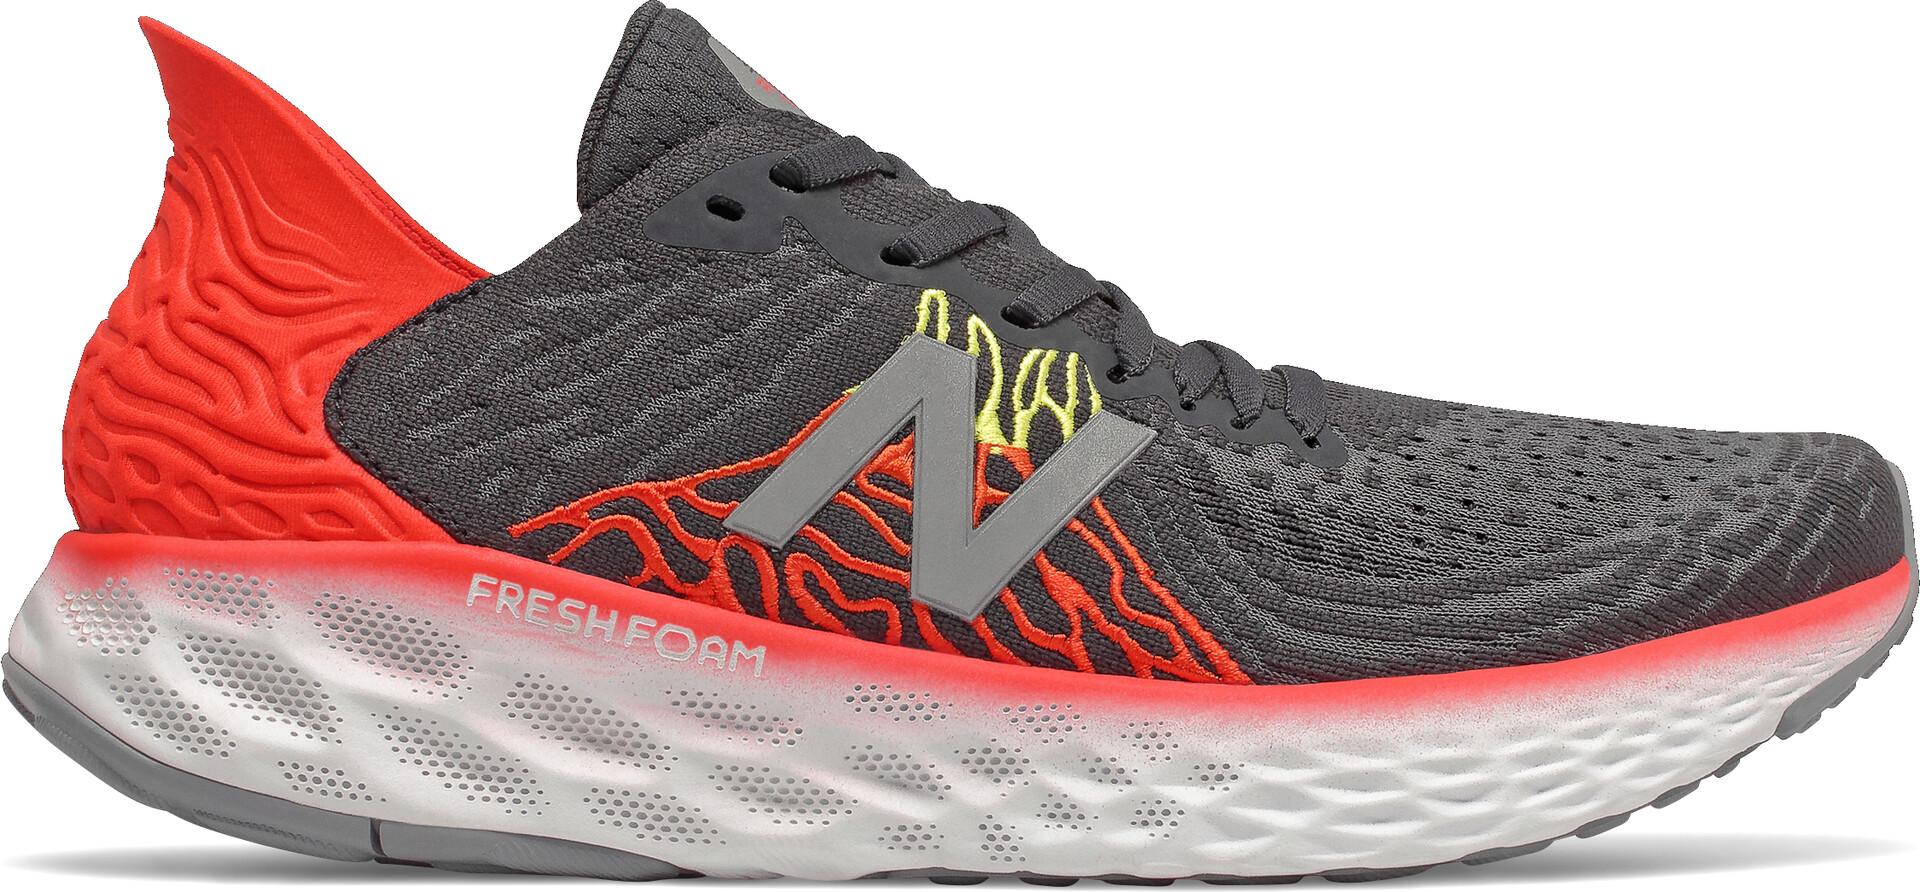 chaussures new balance 1080